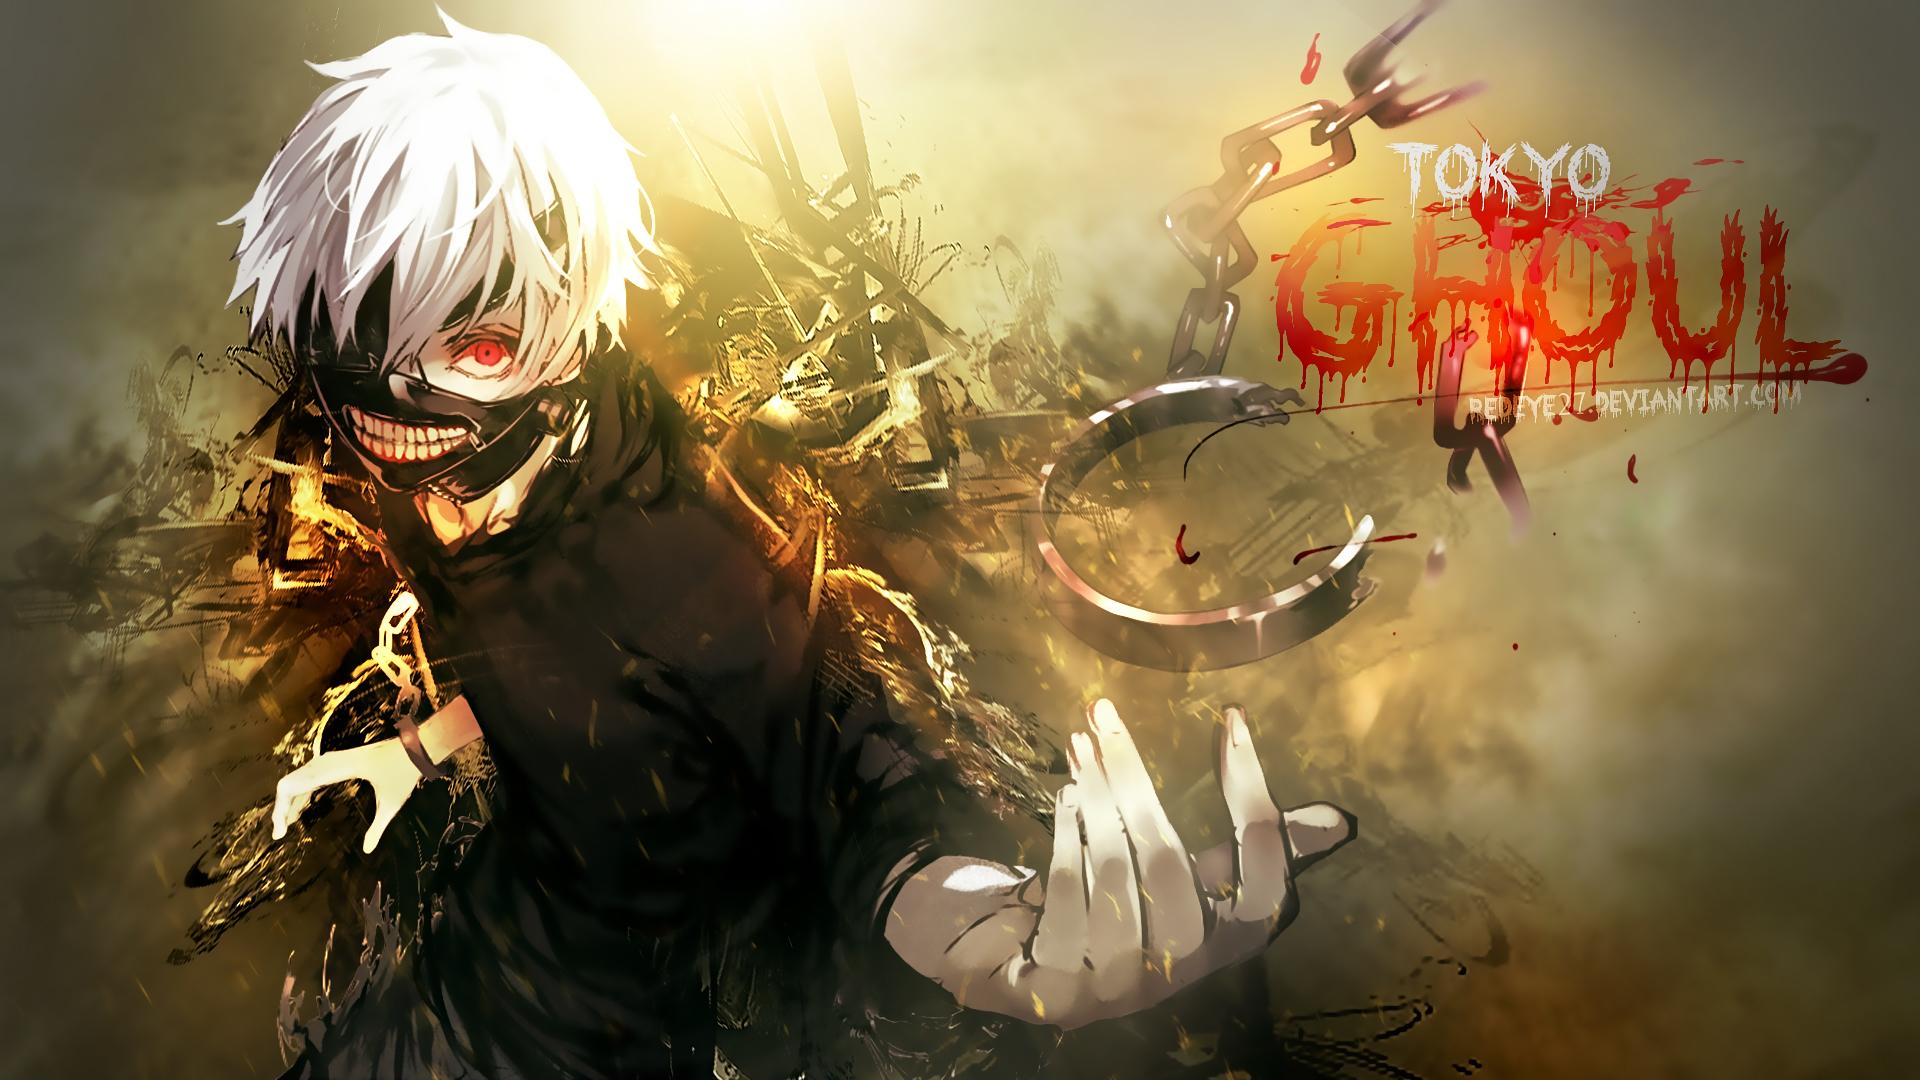 Kaneki Tokyo Ghoul anime red eye mask hd 1920x1080 1080p wallpaper 1920x1080